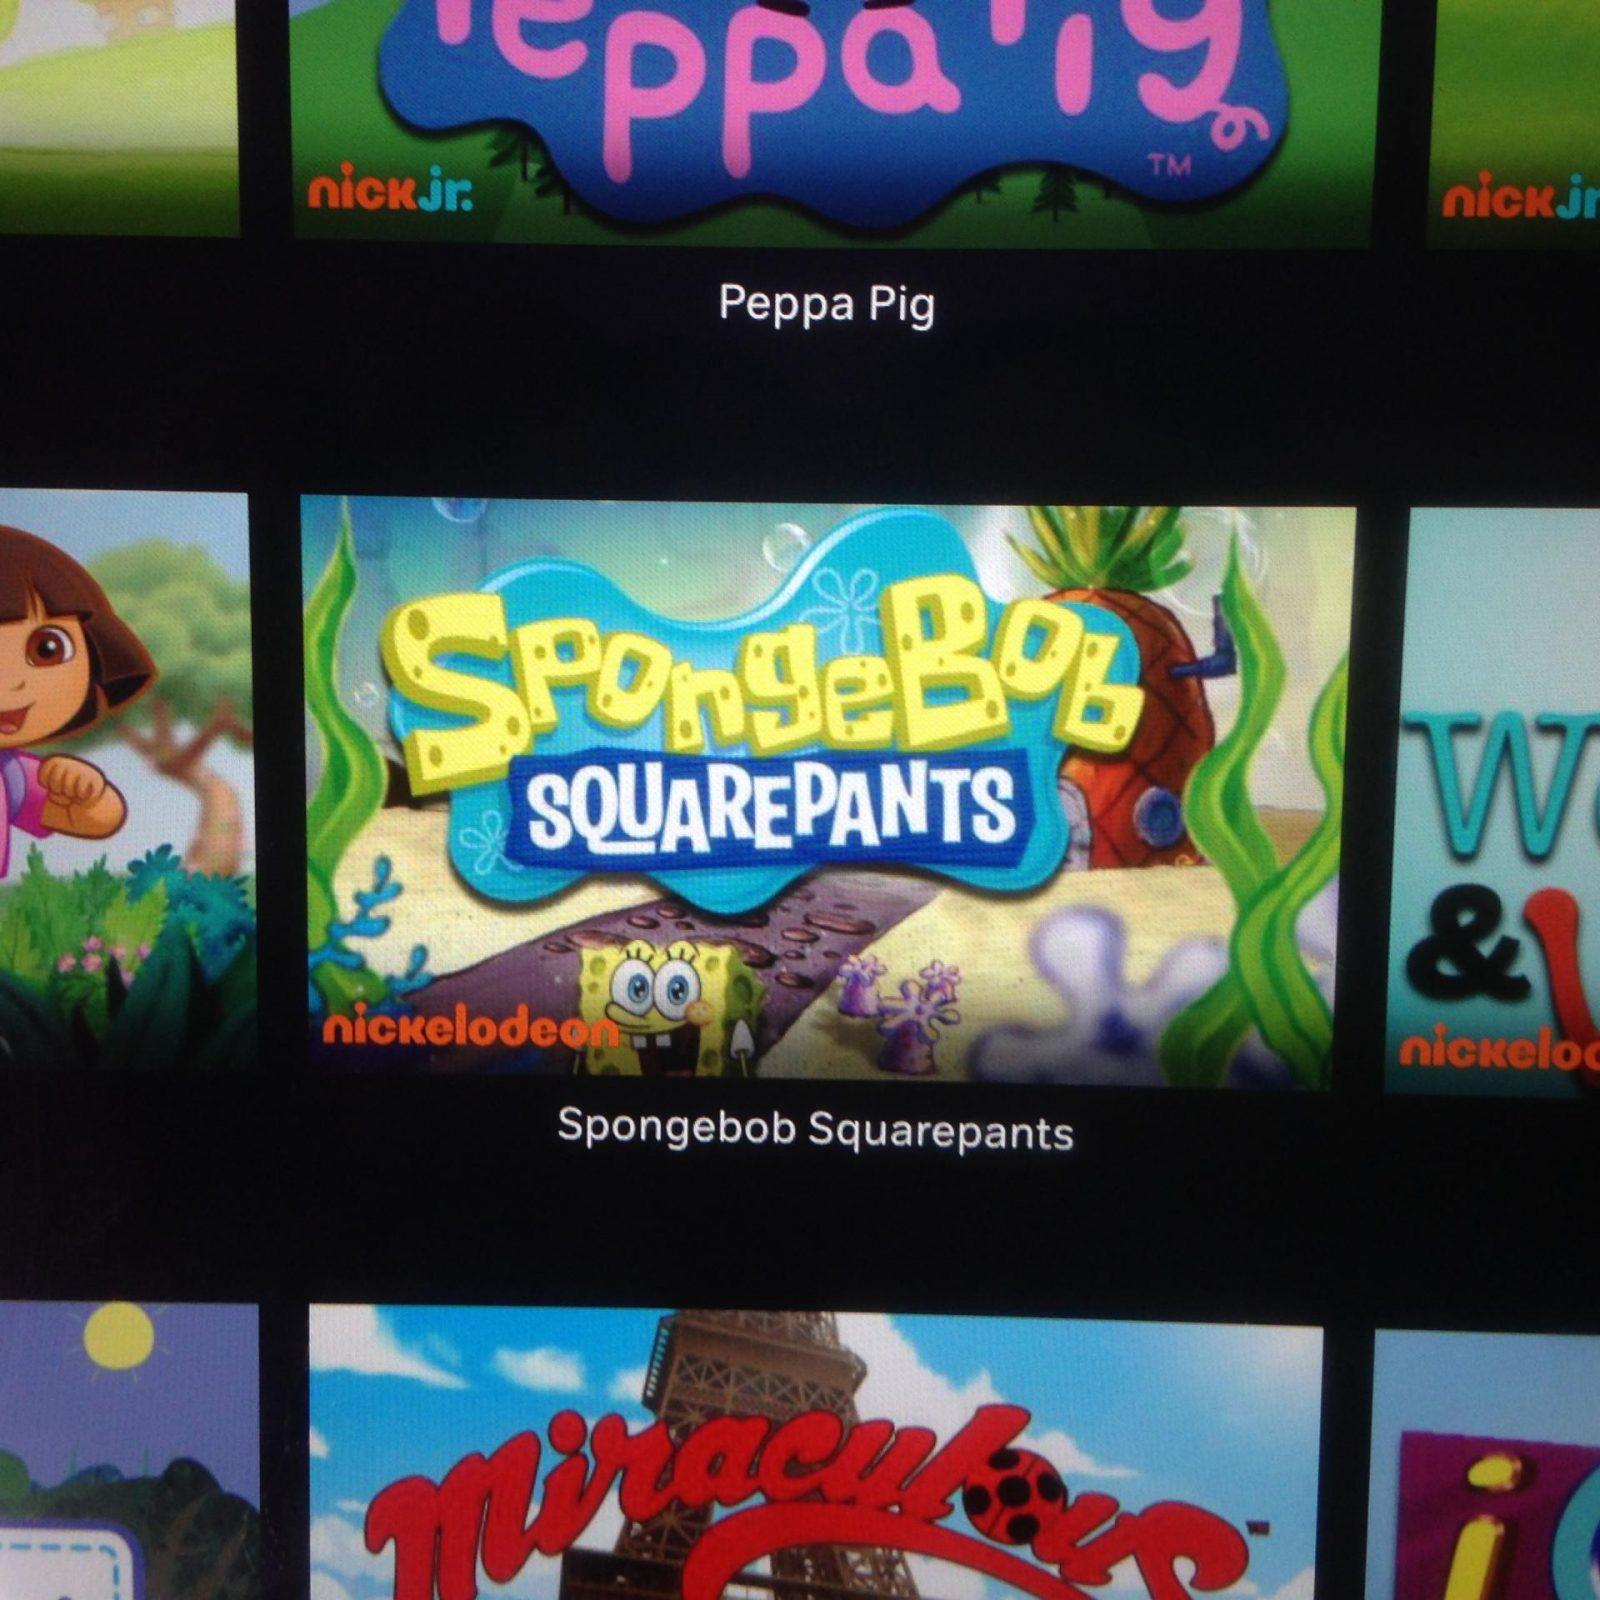 Watch Nickelodeon's SpongeBob SquarePants on NOW TV